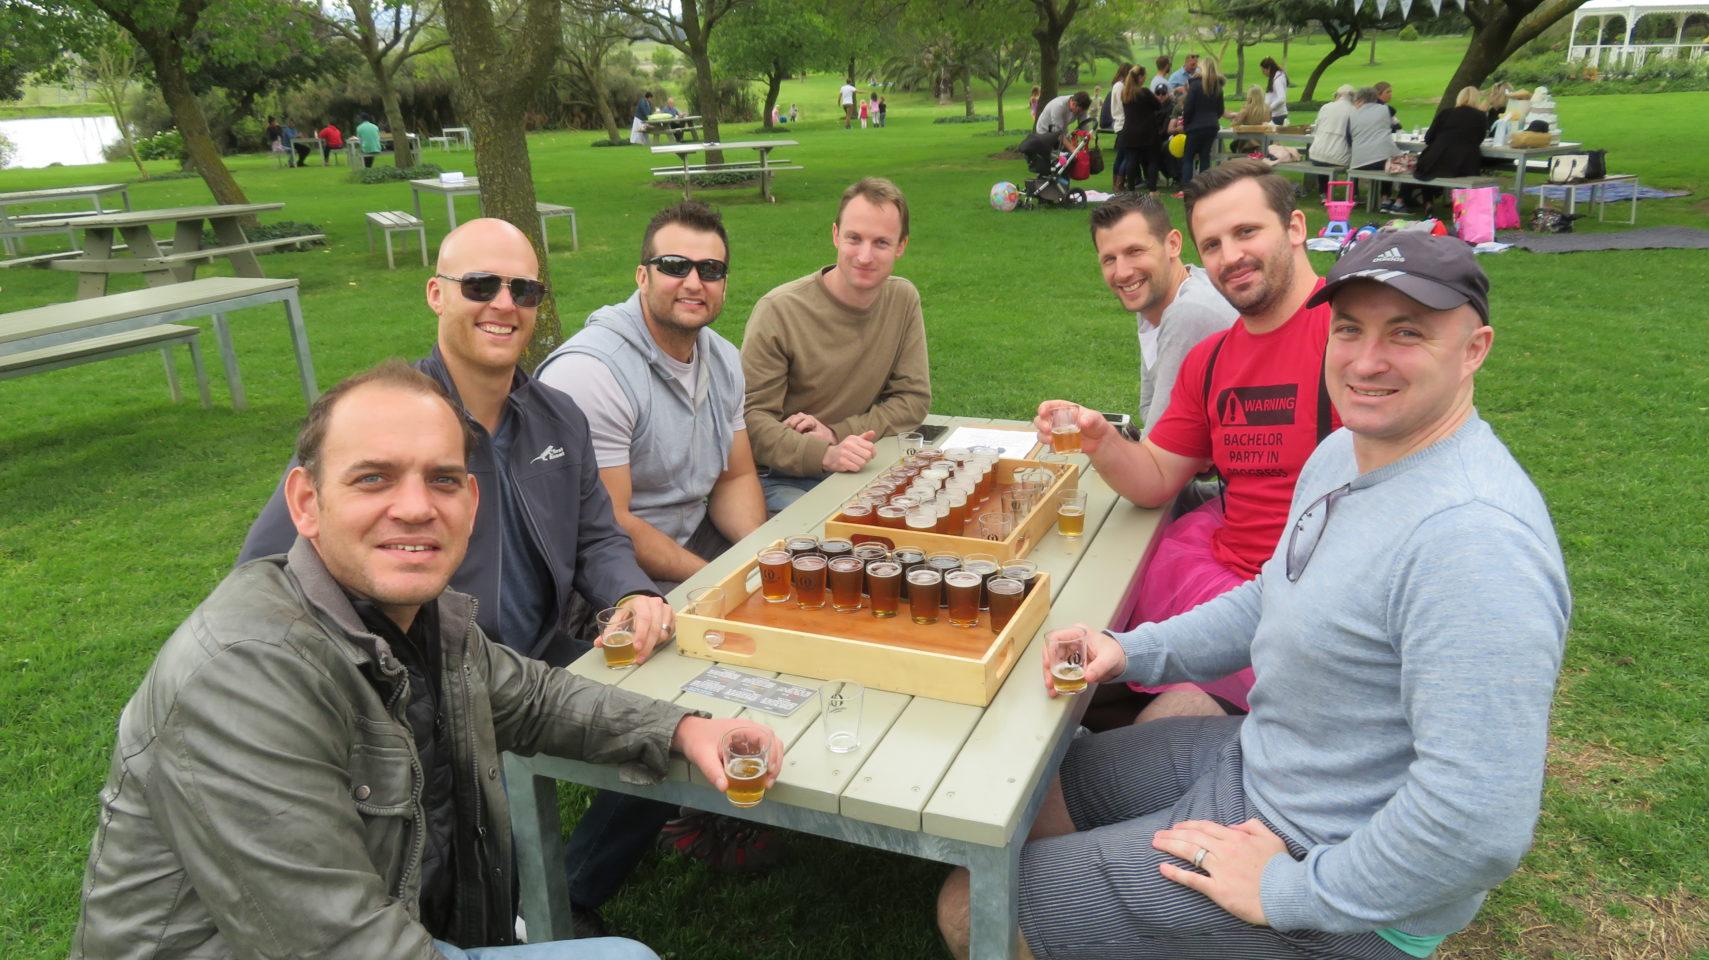 Bachelor Party getting underway with Stellenbosch beer tasting at Joostenberg Farm in Stellenbosch, South Africa